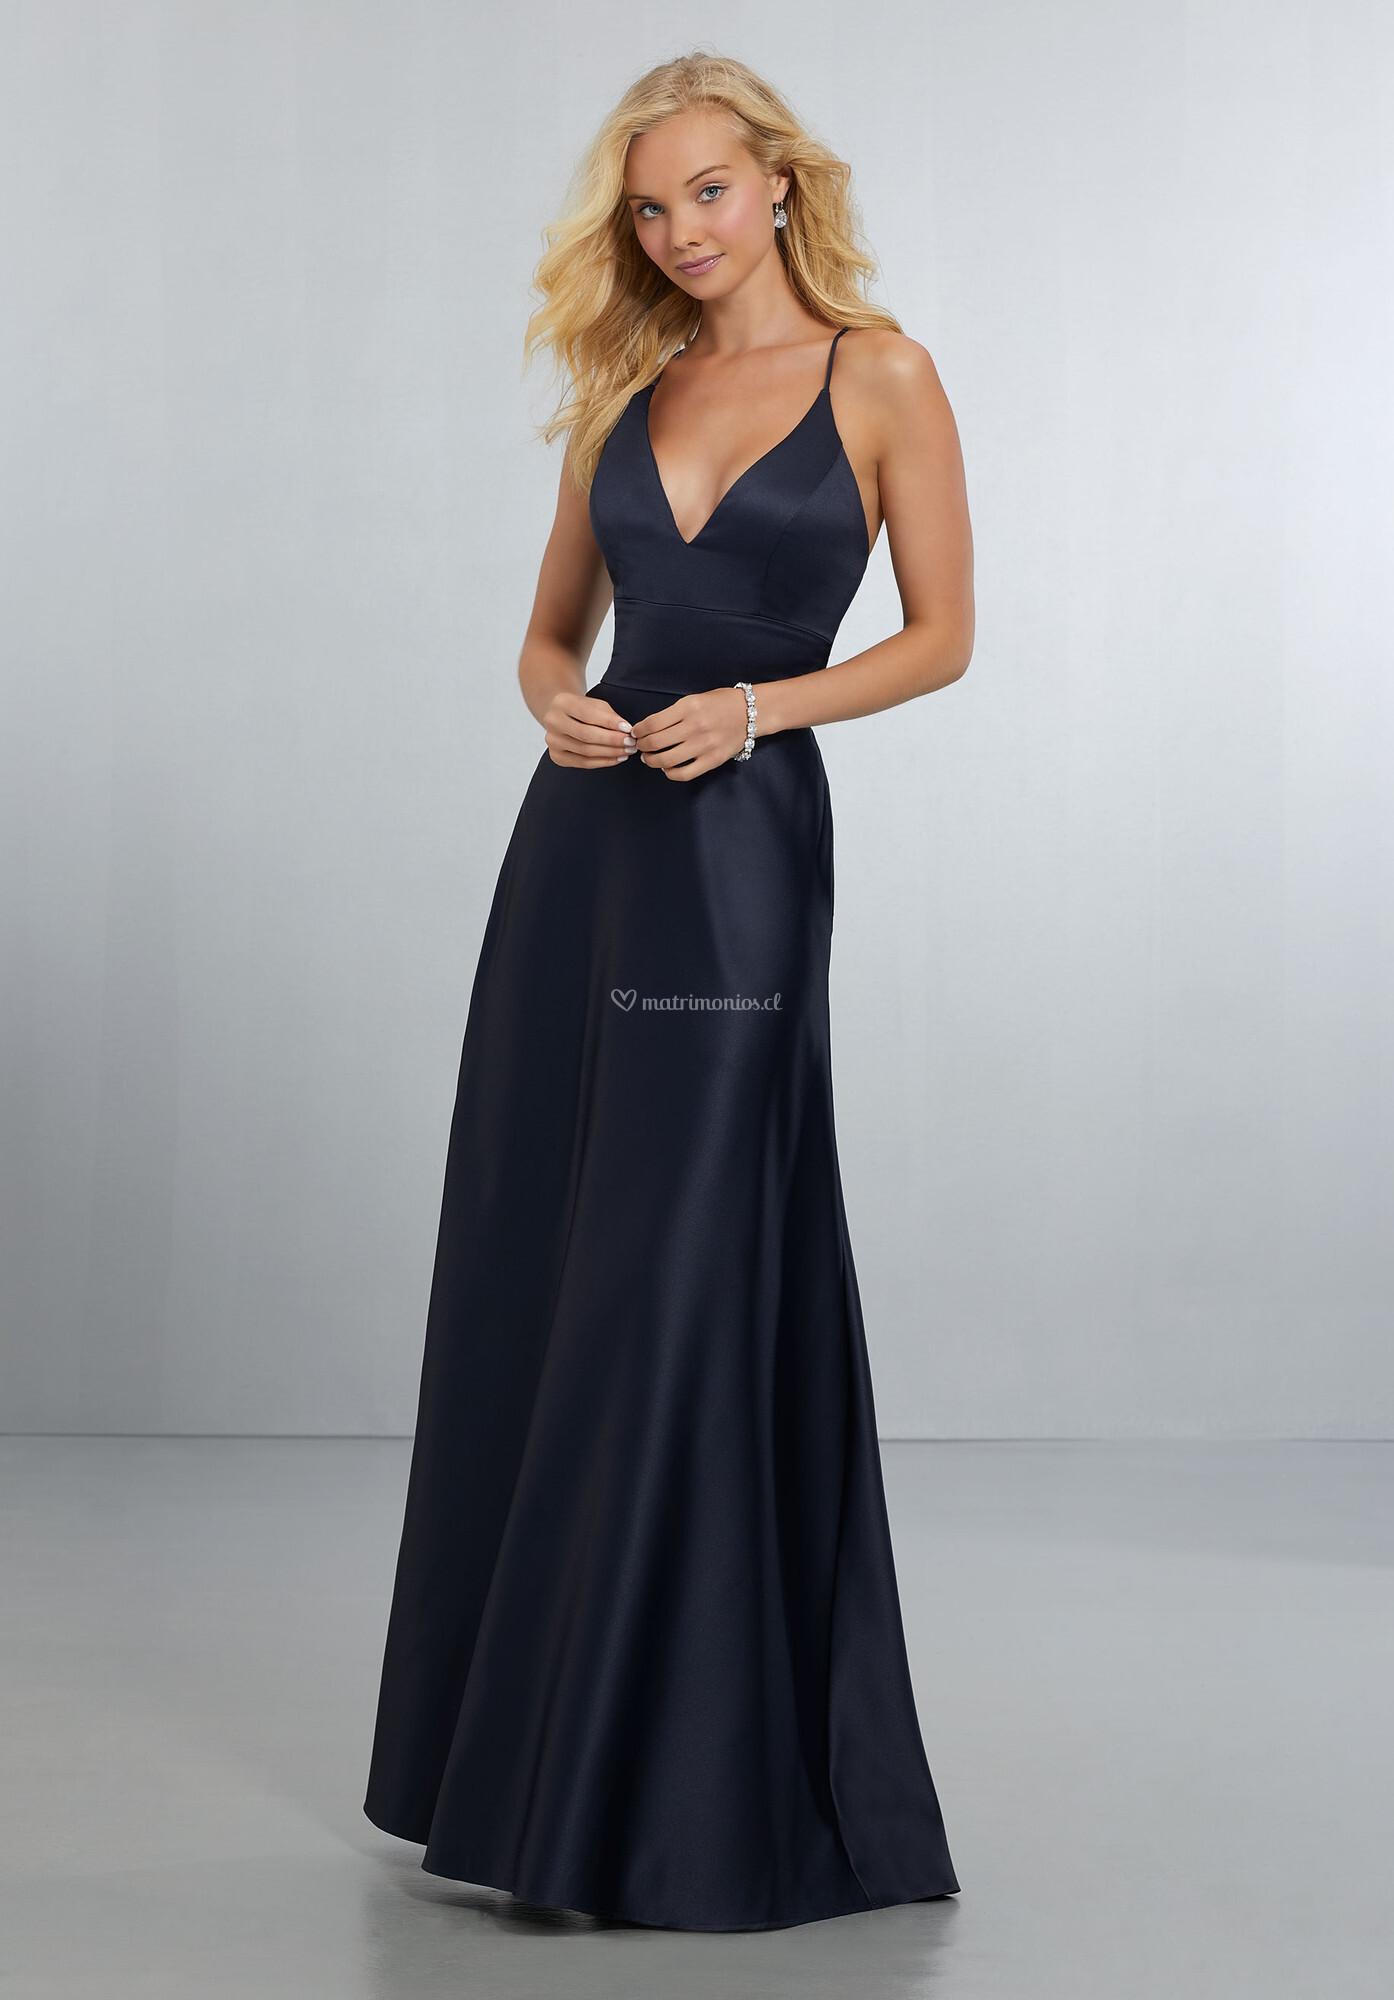 aa81ad561 Vestidos de Fiesta de Morilee - 2018 - Matrimonios.cl